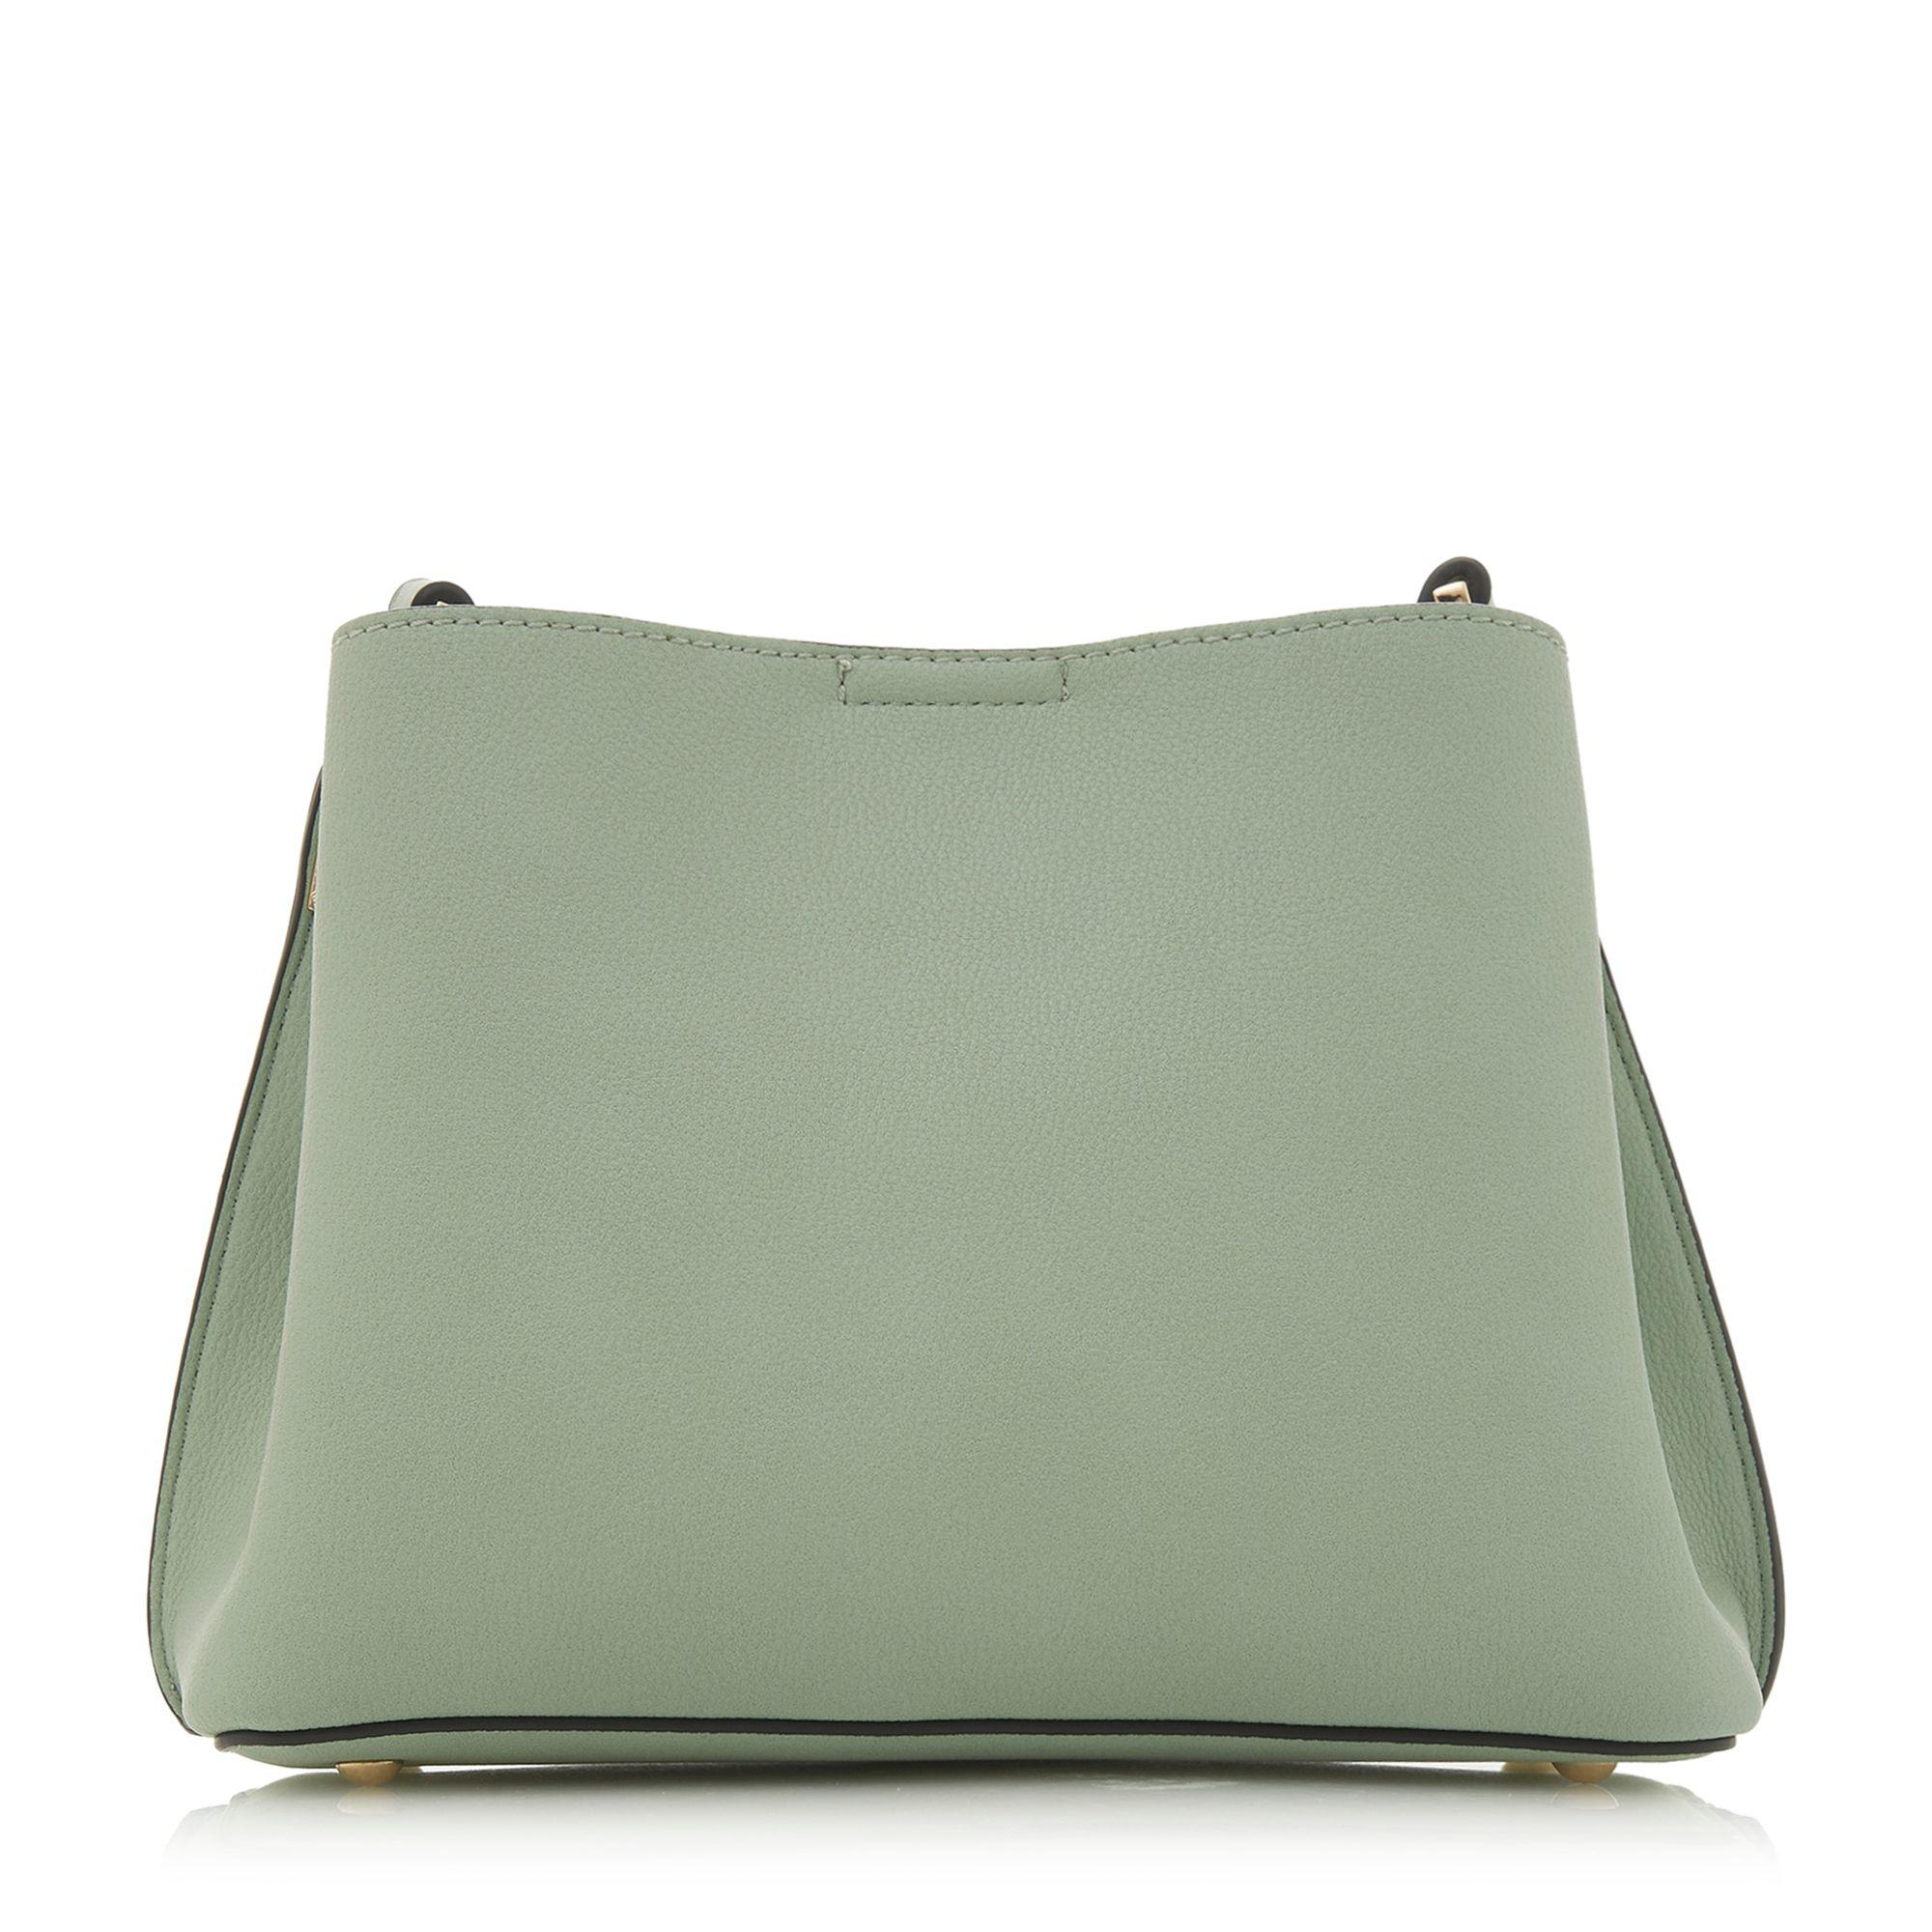 Dune Light Green 'dinidarrow' Textured Small Cross-body Bag